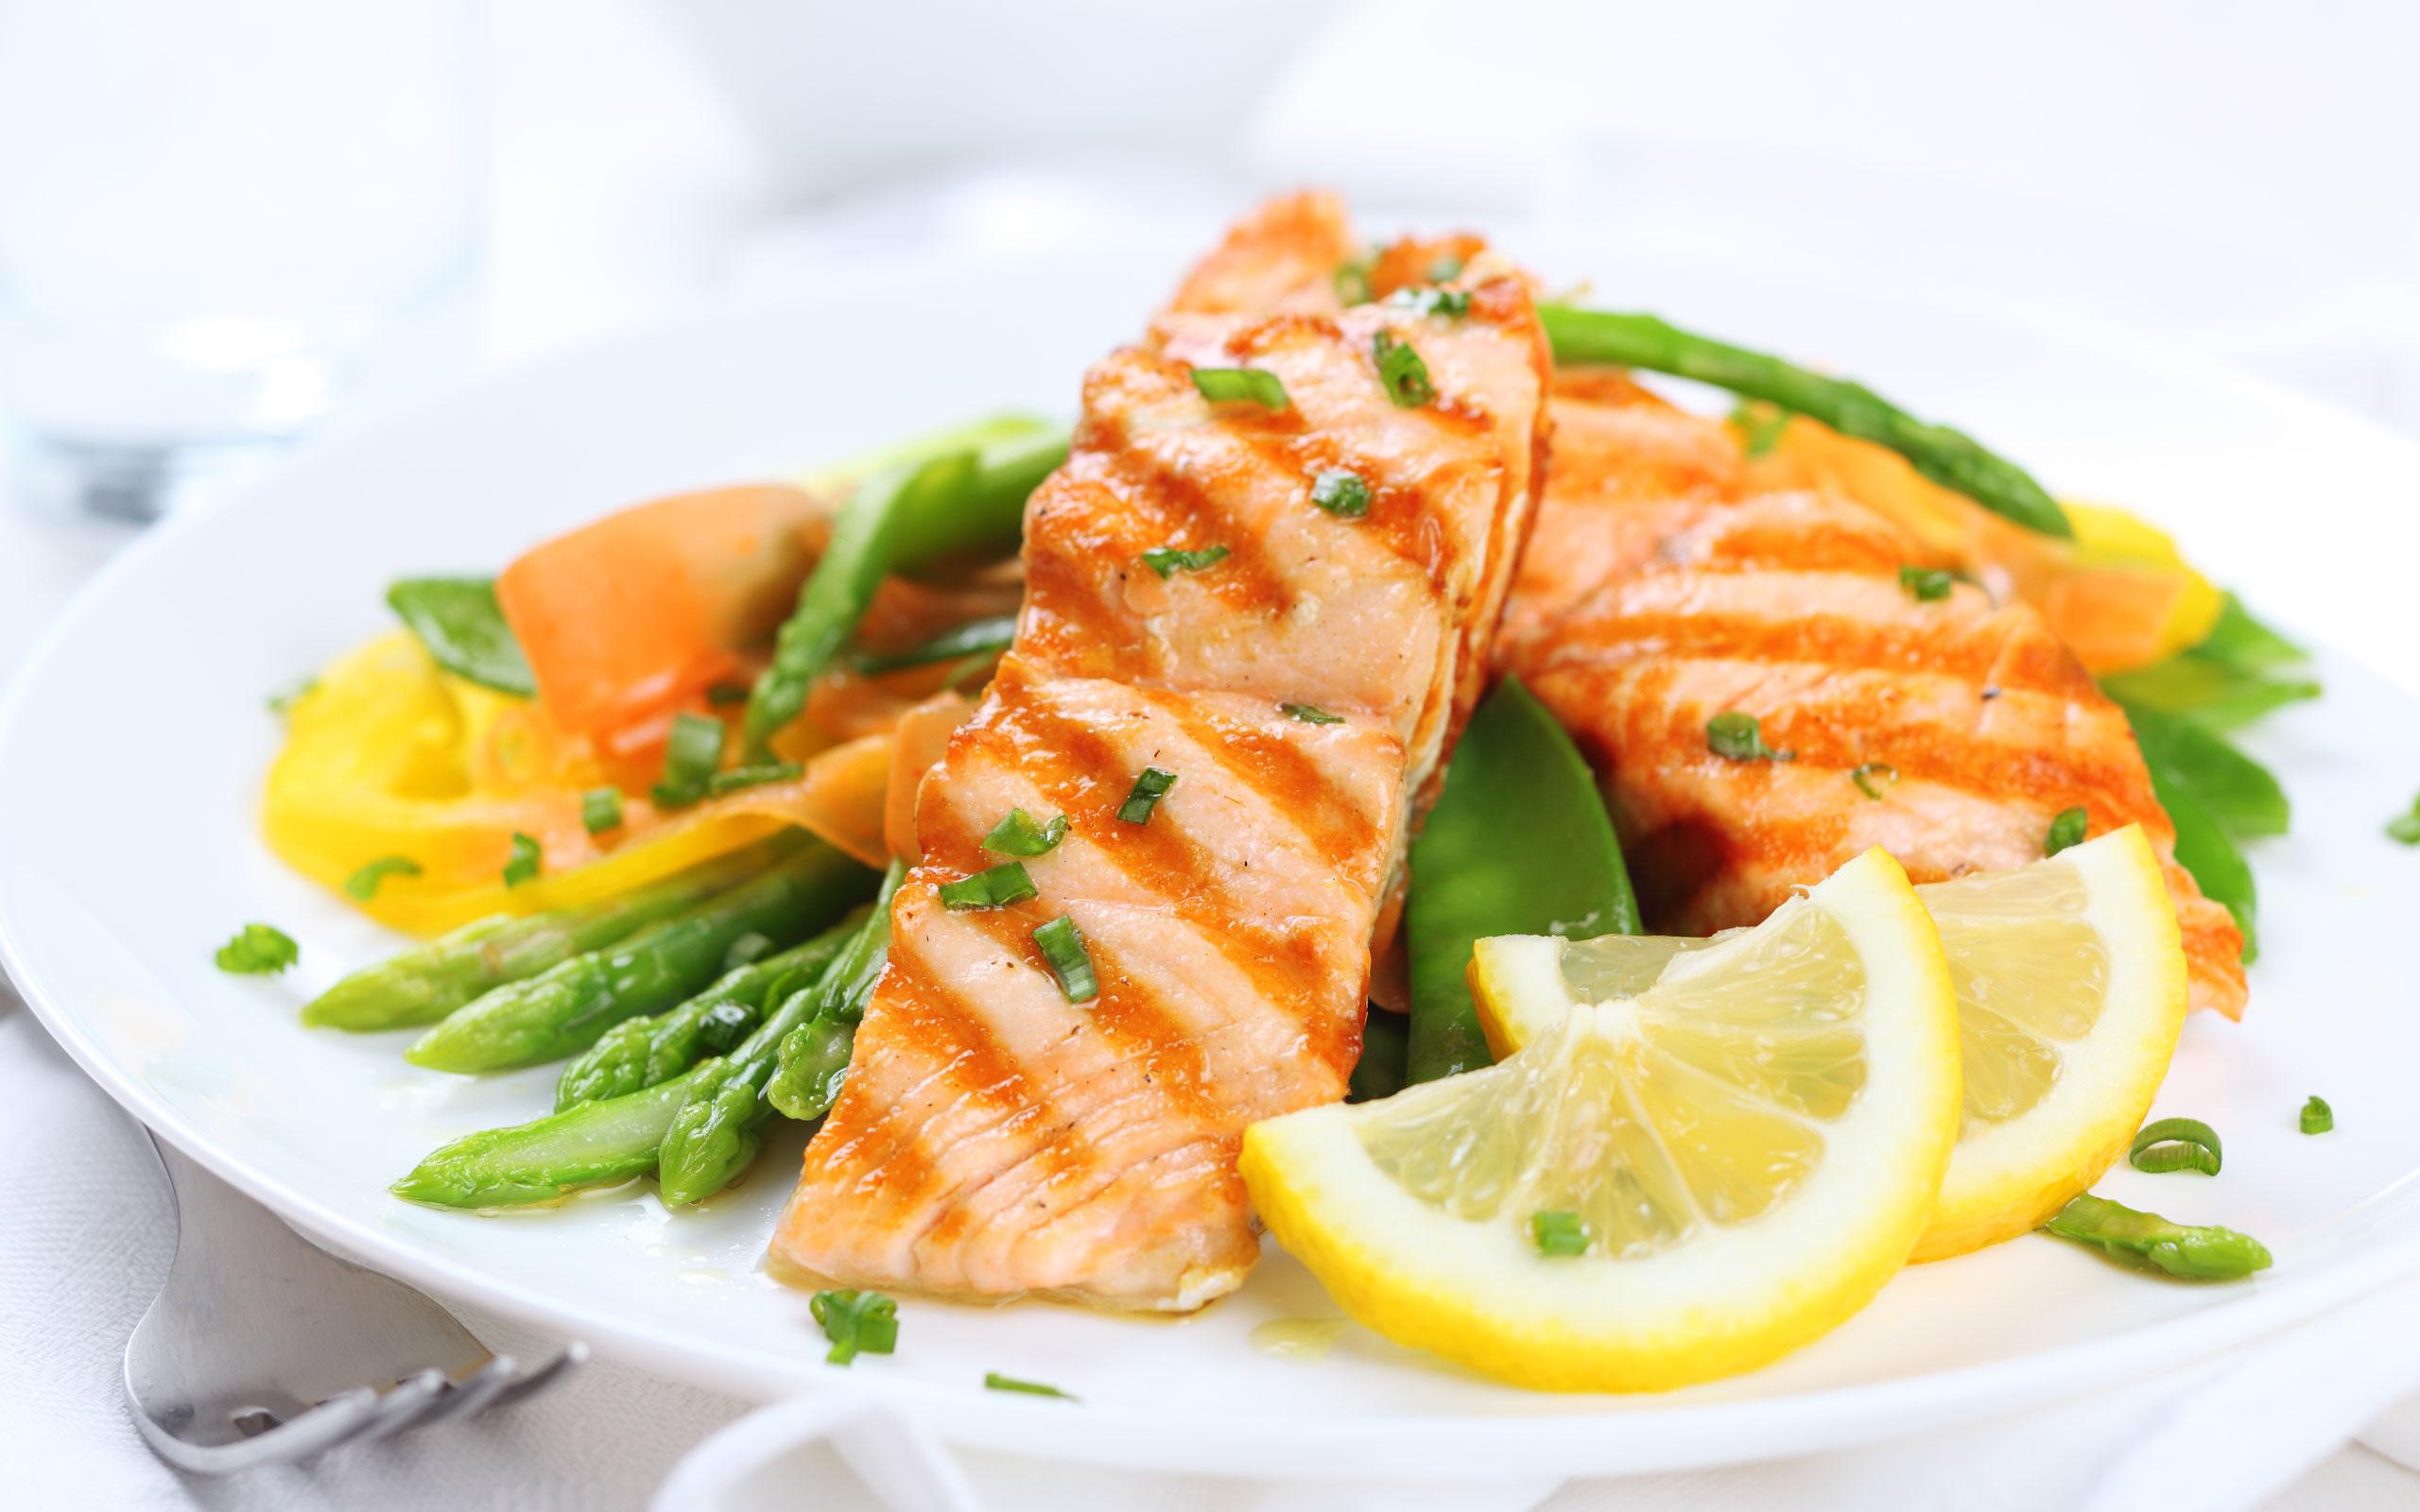 Meal HD wallpapers, Desktop wallpaper - most viewed